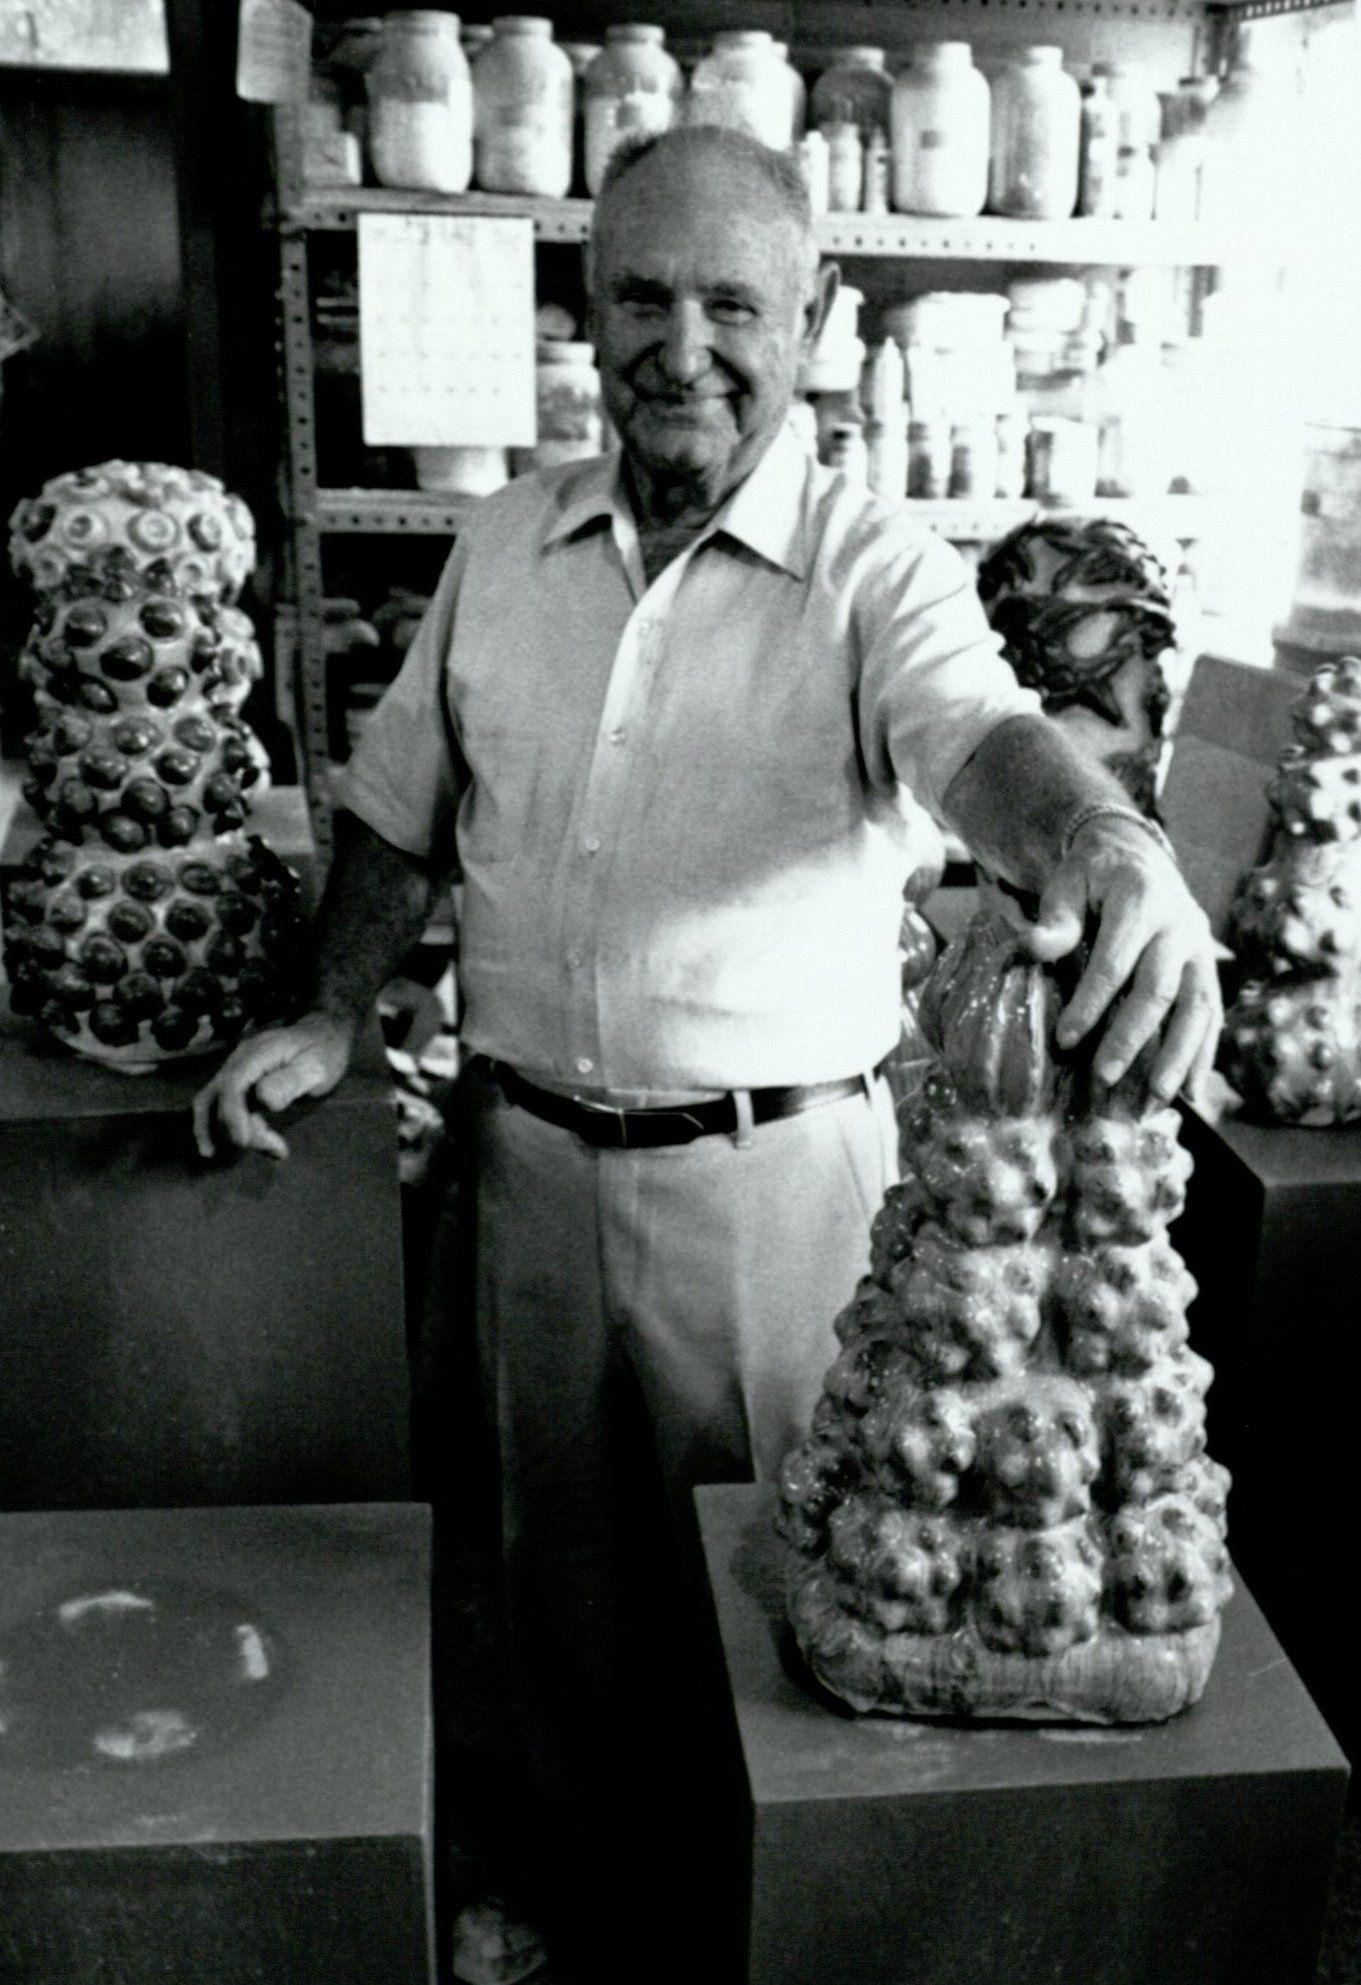 Harding Black photograph, circa 1990